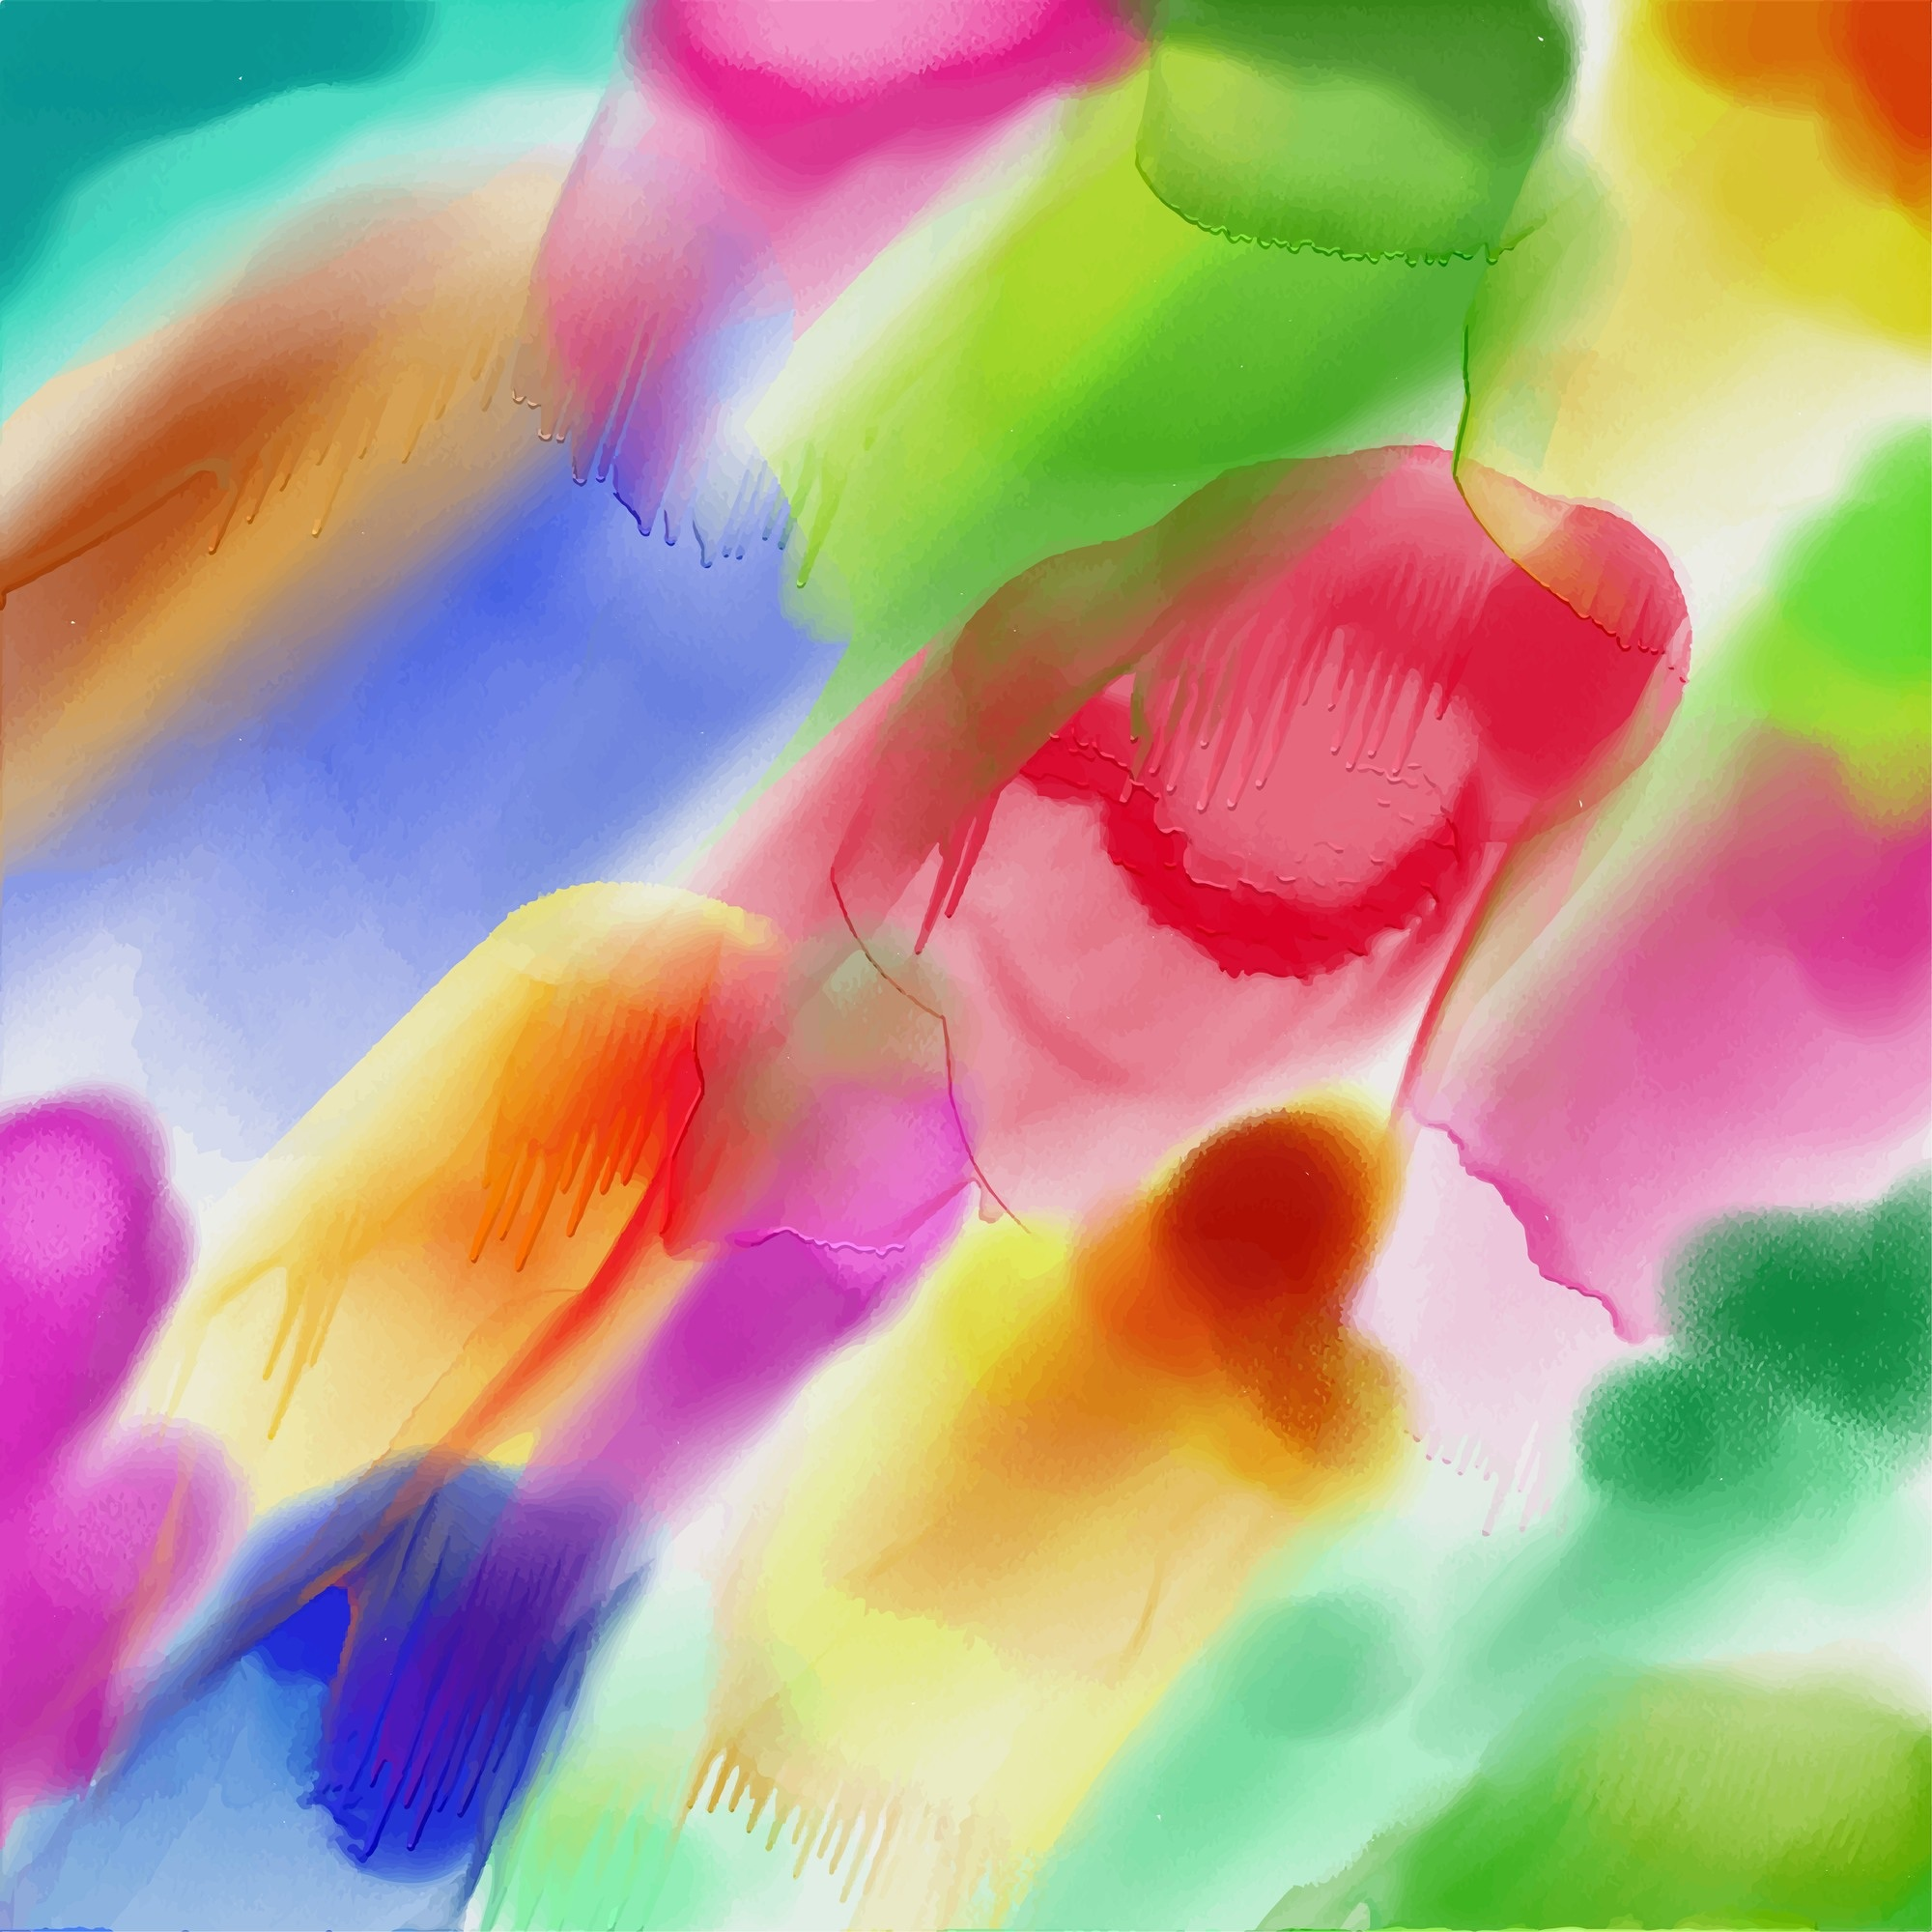 watercolor-2439011.jpg